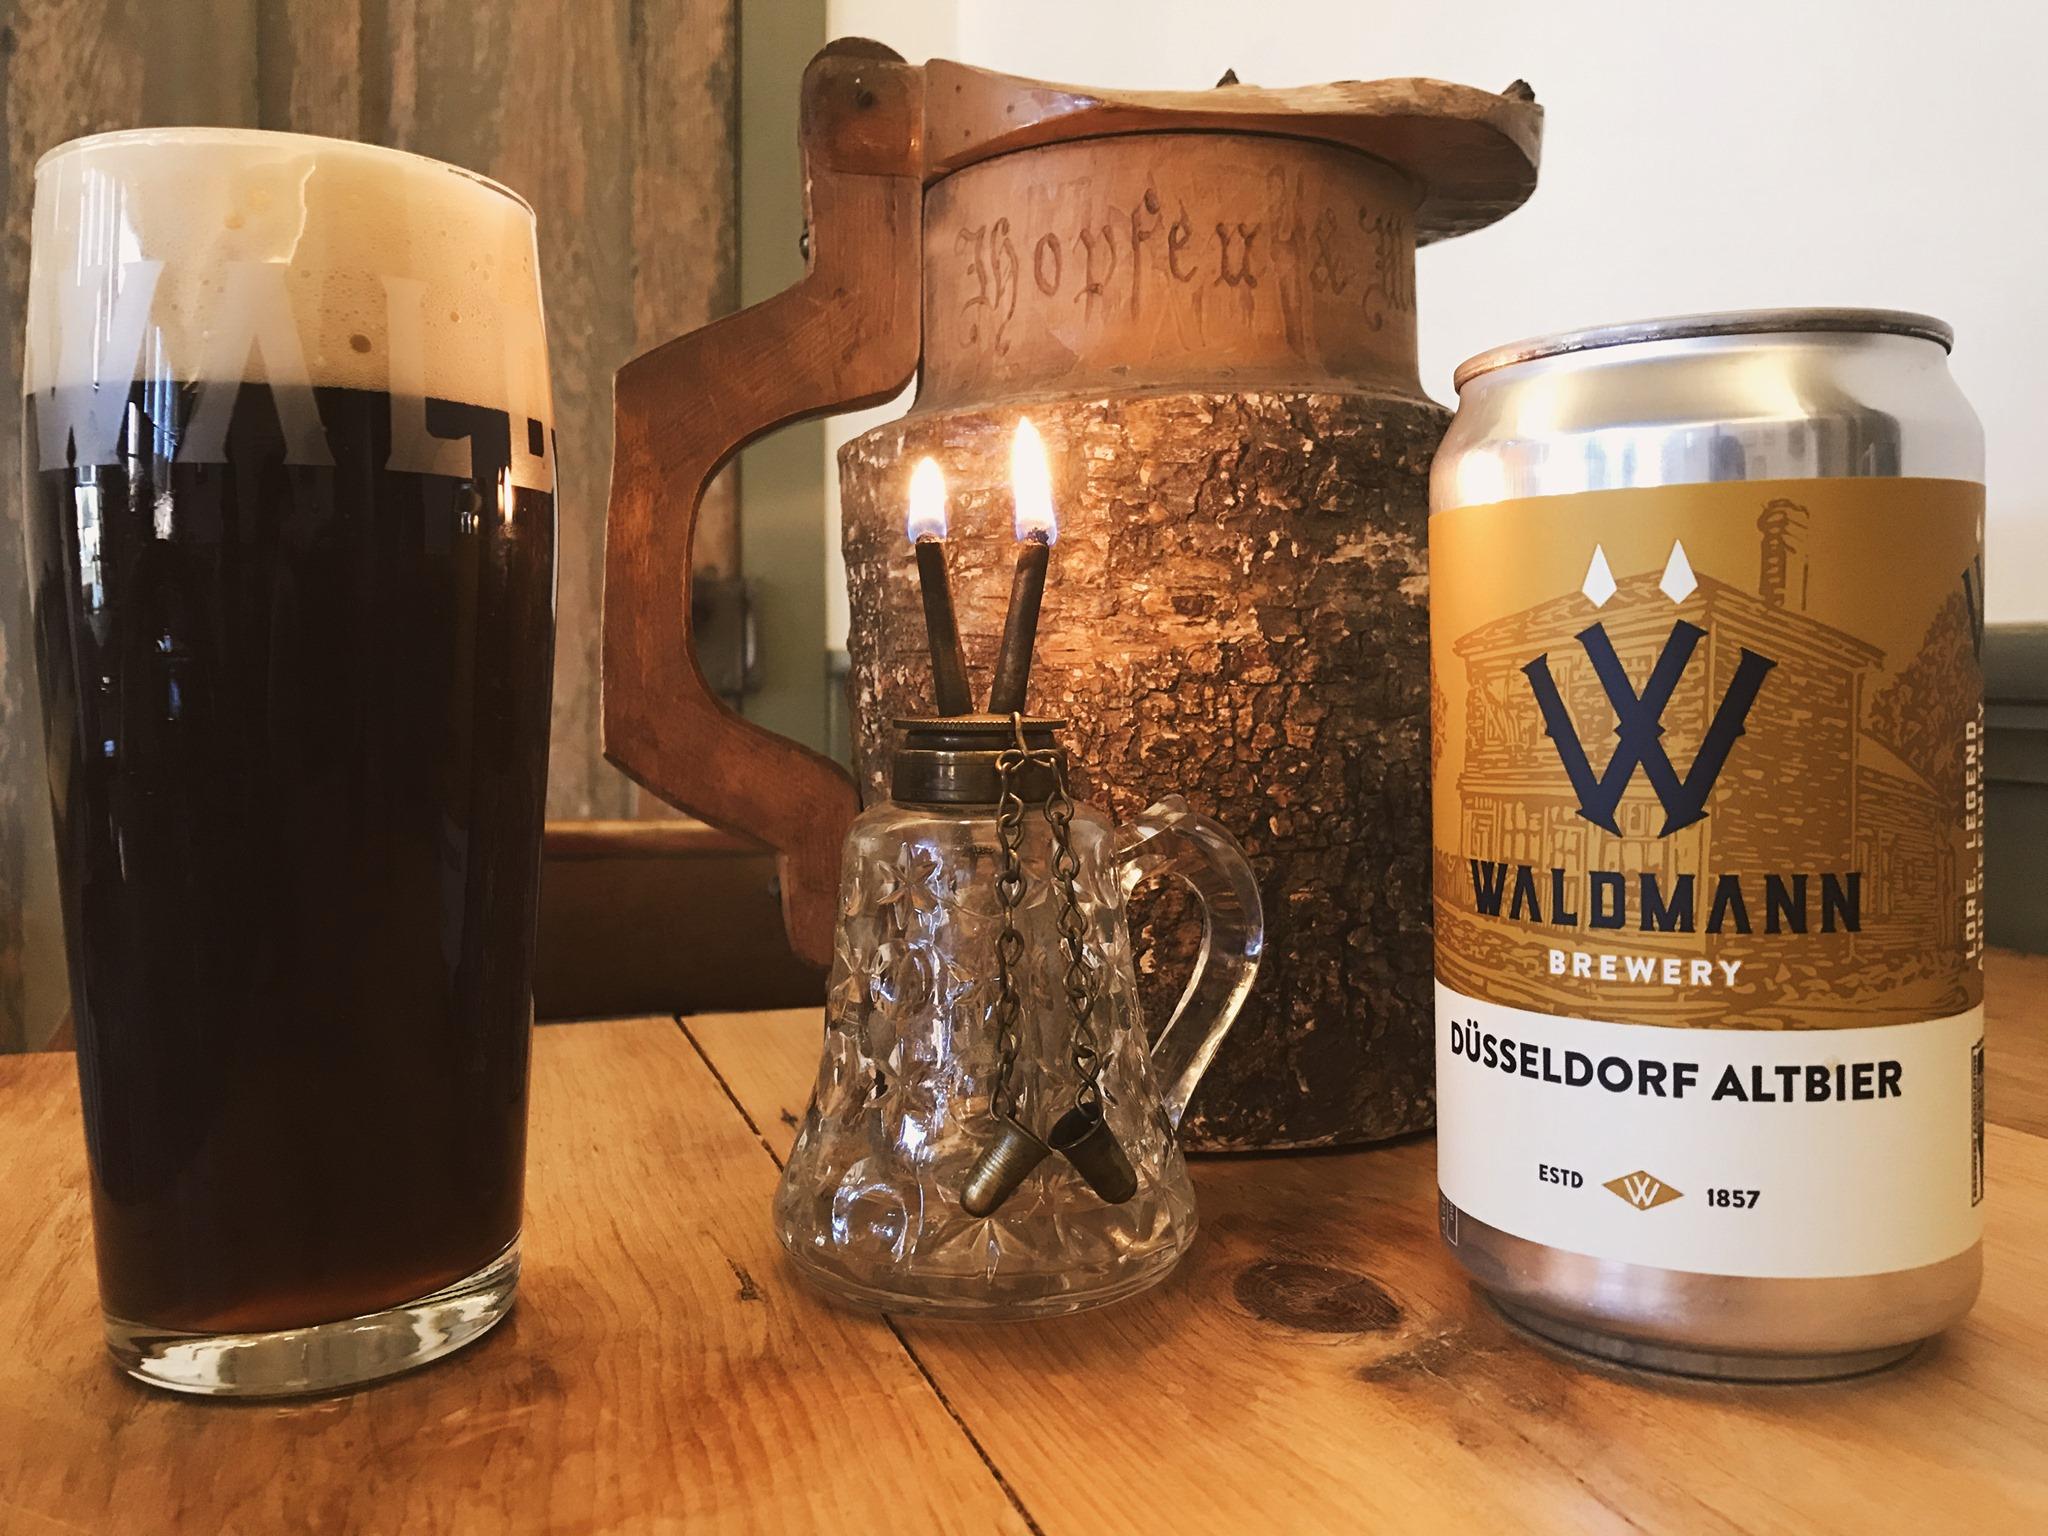 Waldmann Dusseldorf Altbier • Photo via Waldmann Brewery